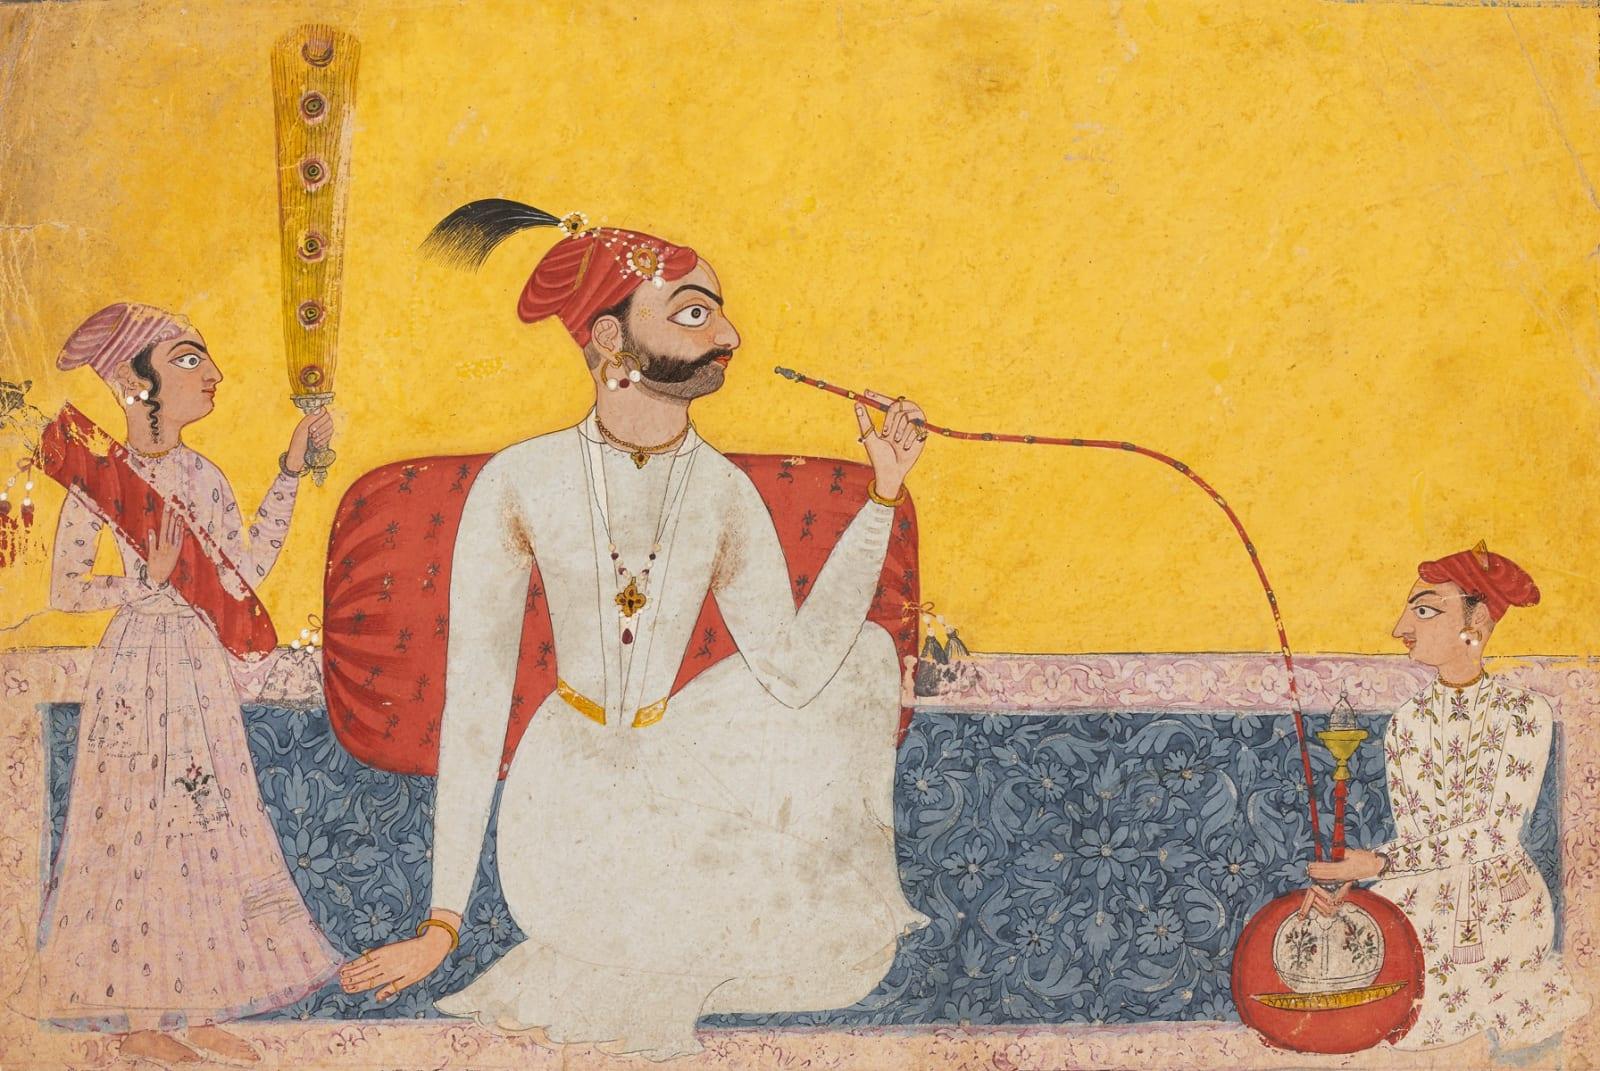 A Nobleman smoking a Hookah, perhaps Raja Tedhi Singh of Mankot as a young man, Mankot, c.1700–1730